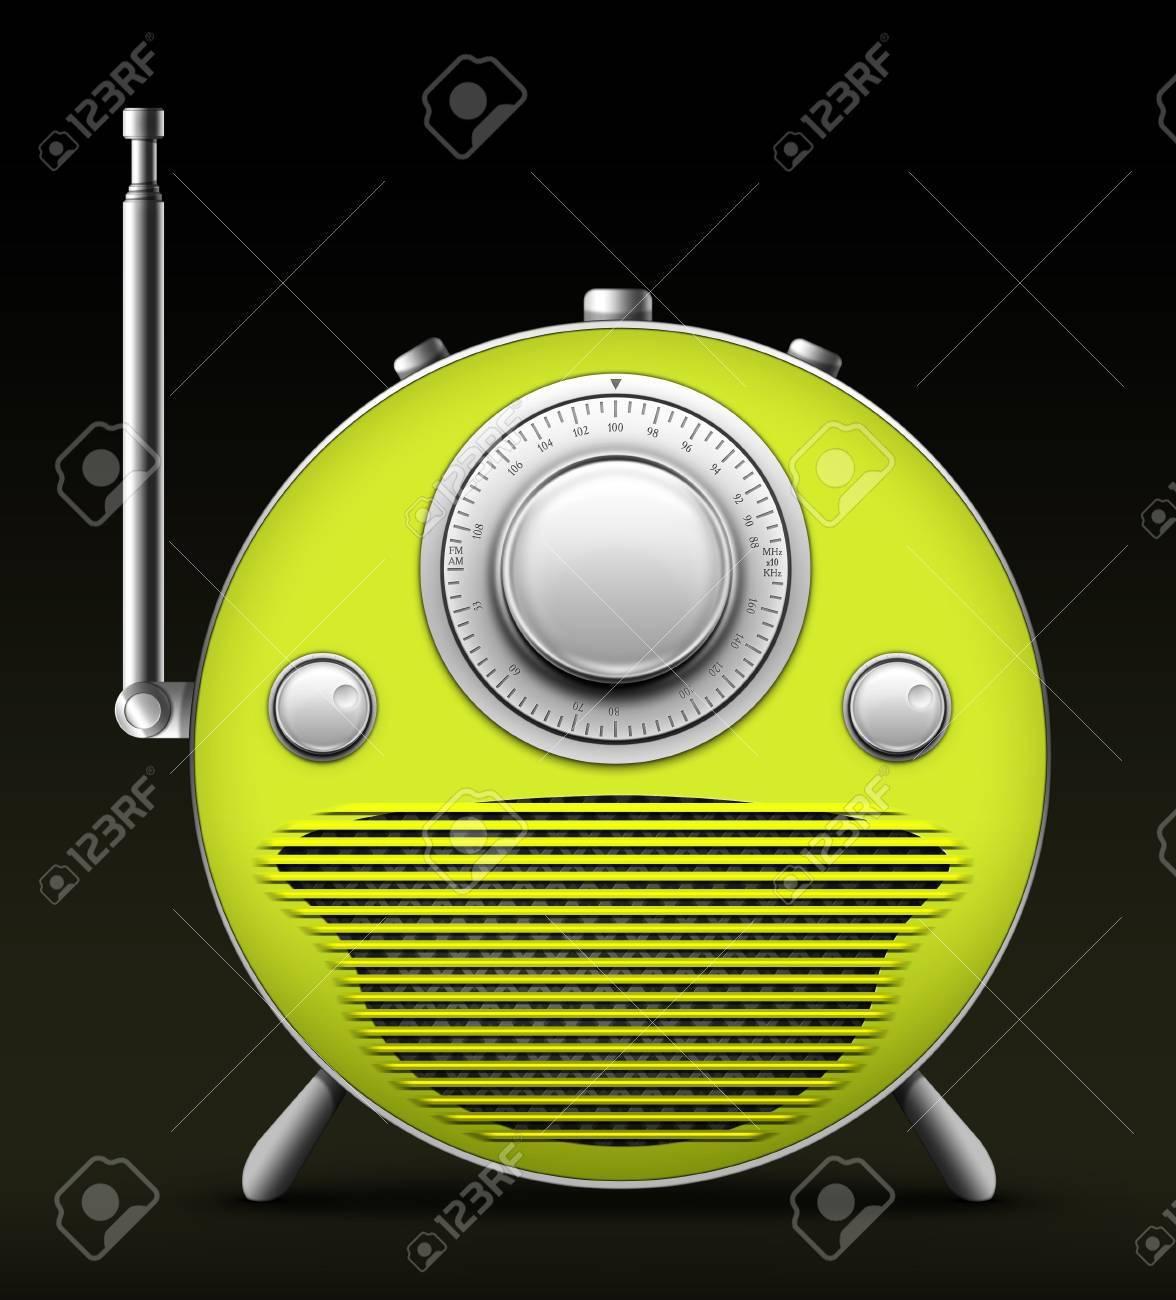 Old Style Radio on the Black background. Computer Designe, 2D Graphics Stock Photo - 5869347